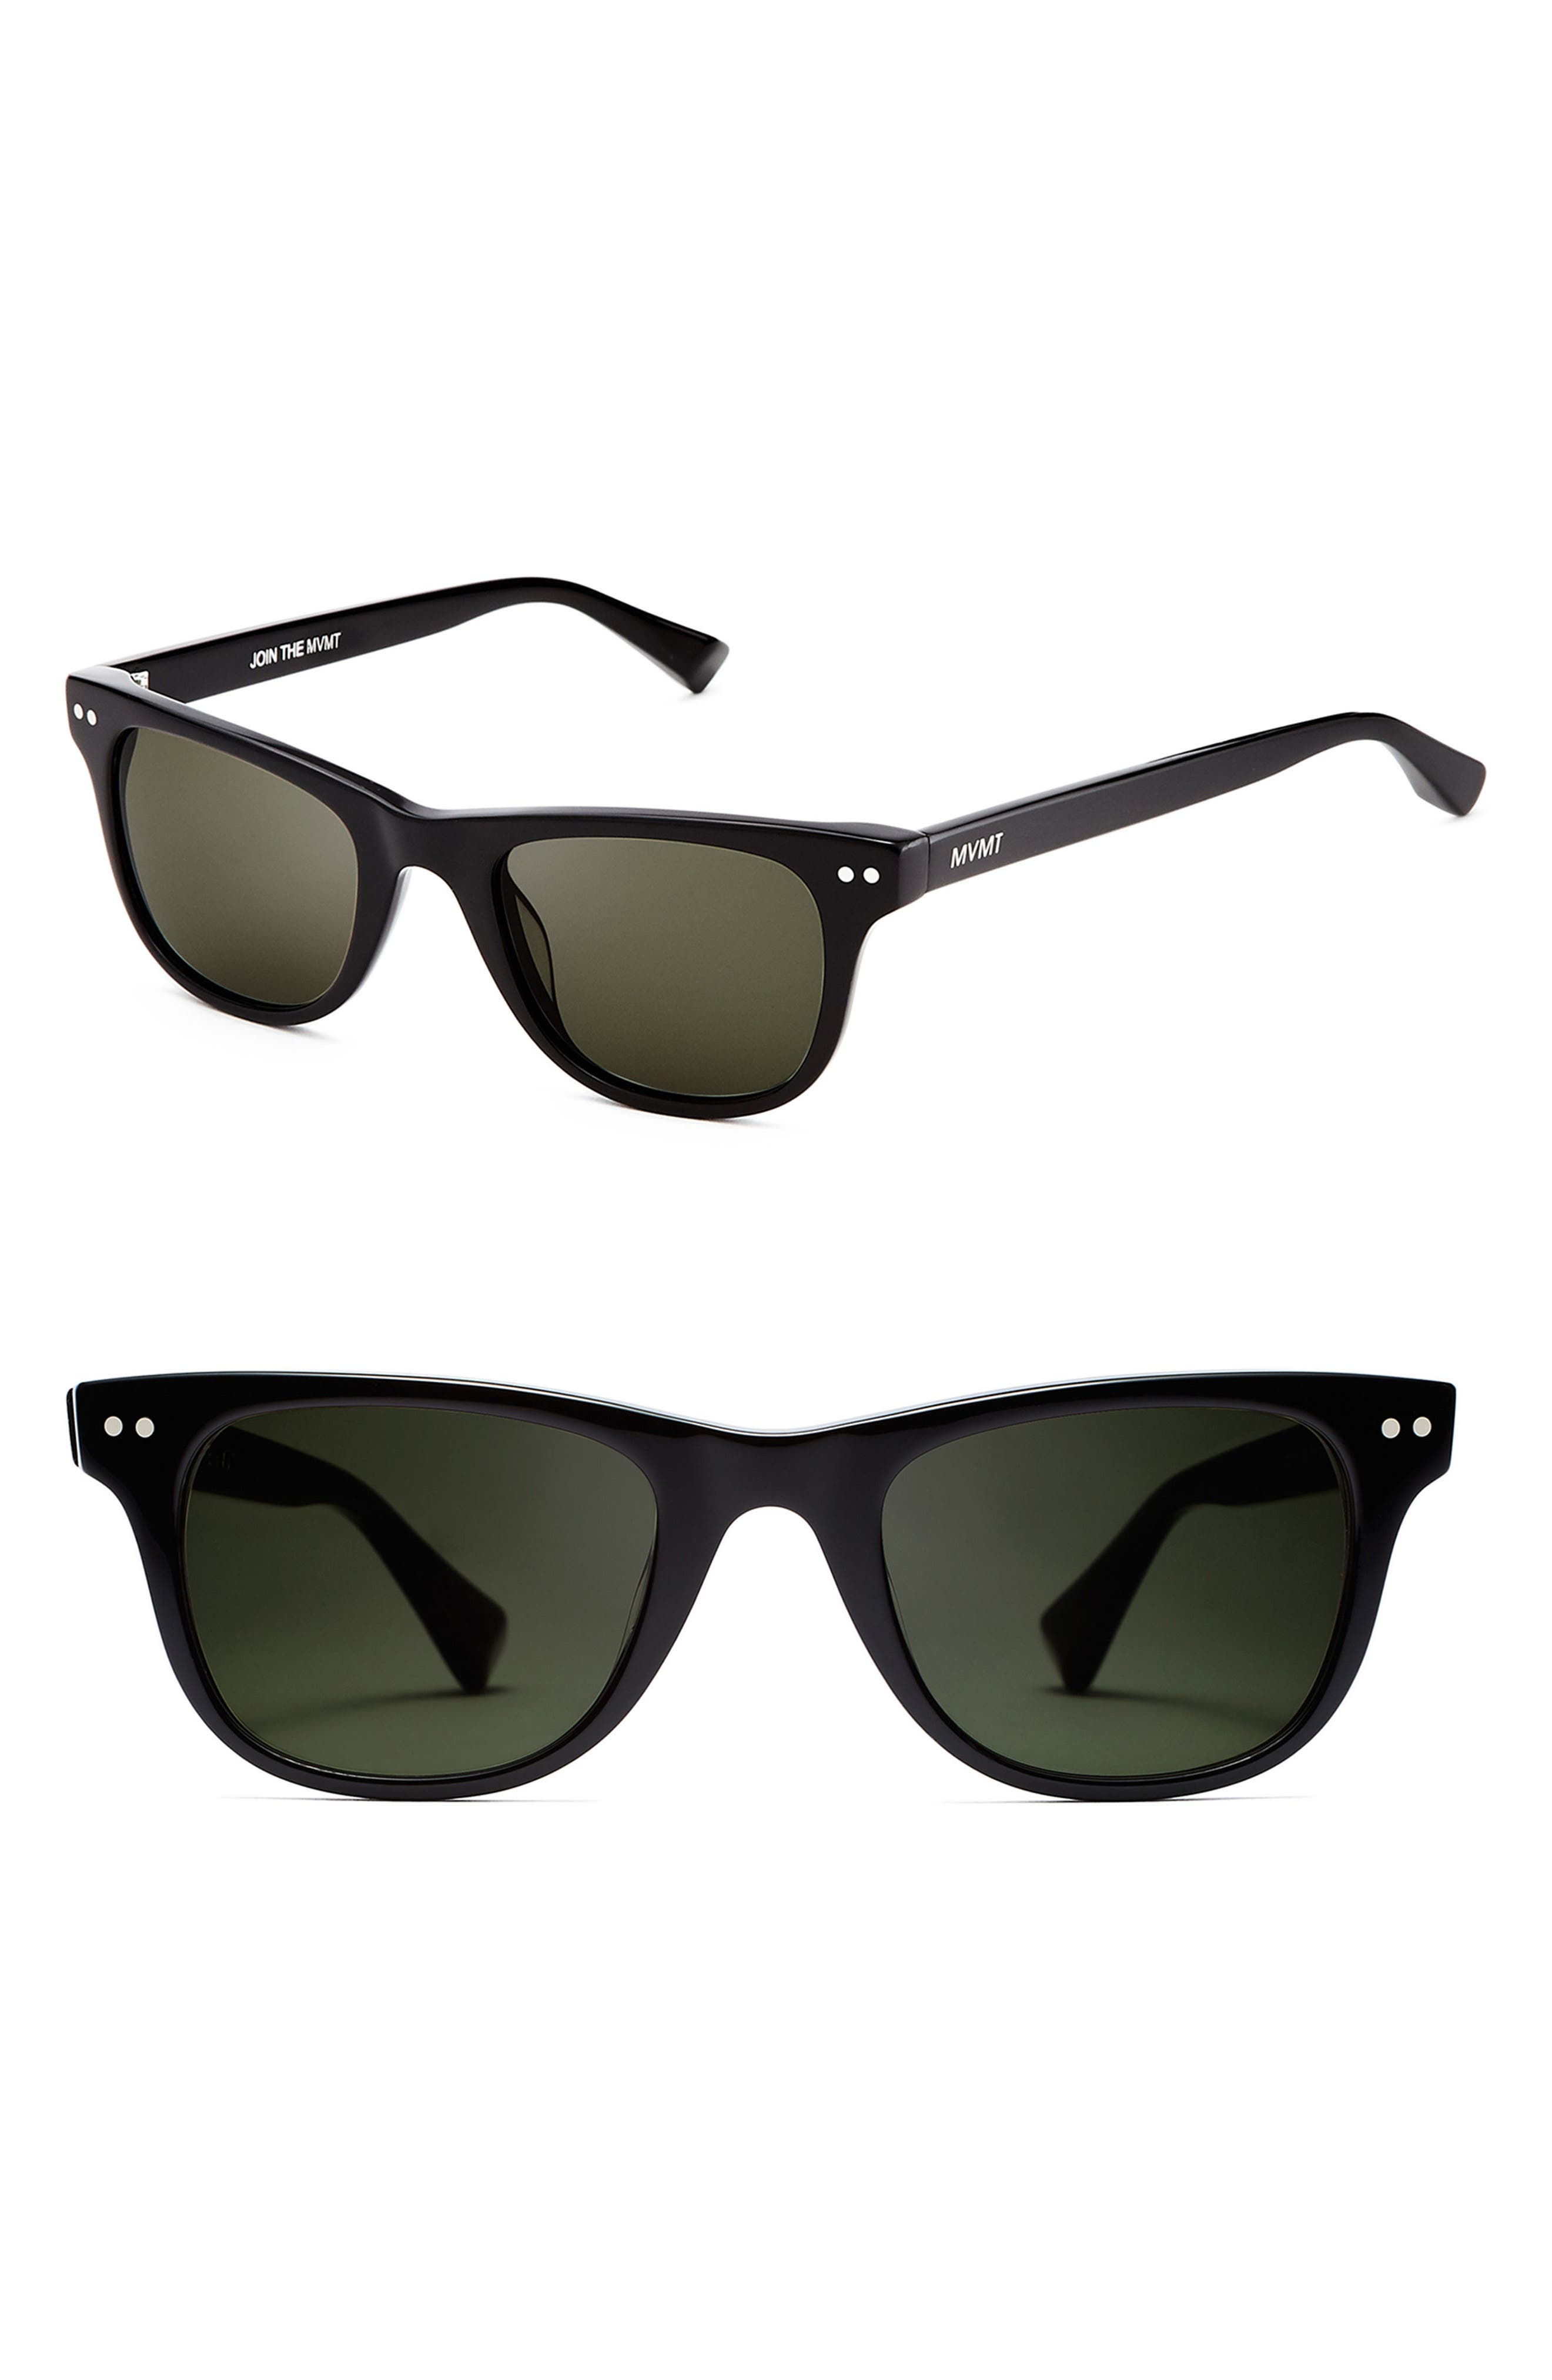 Outsider 51mm Polarized Sunglasses,                         Main,                         color, Pure Black